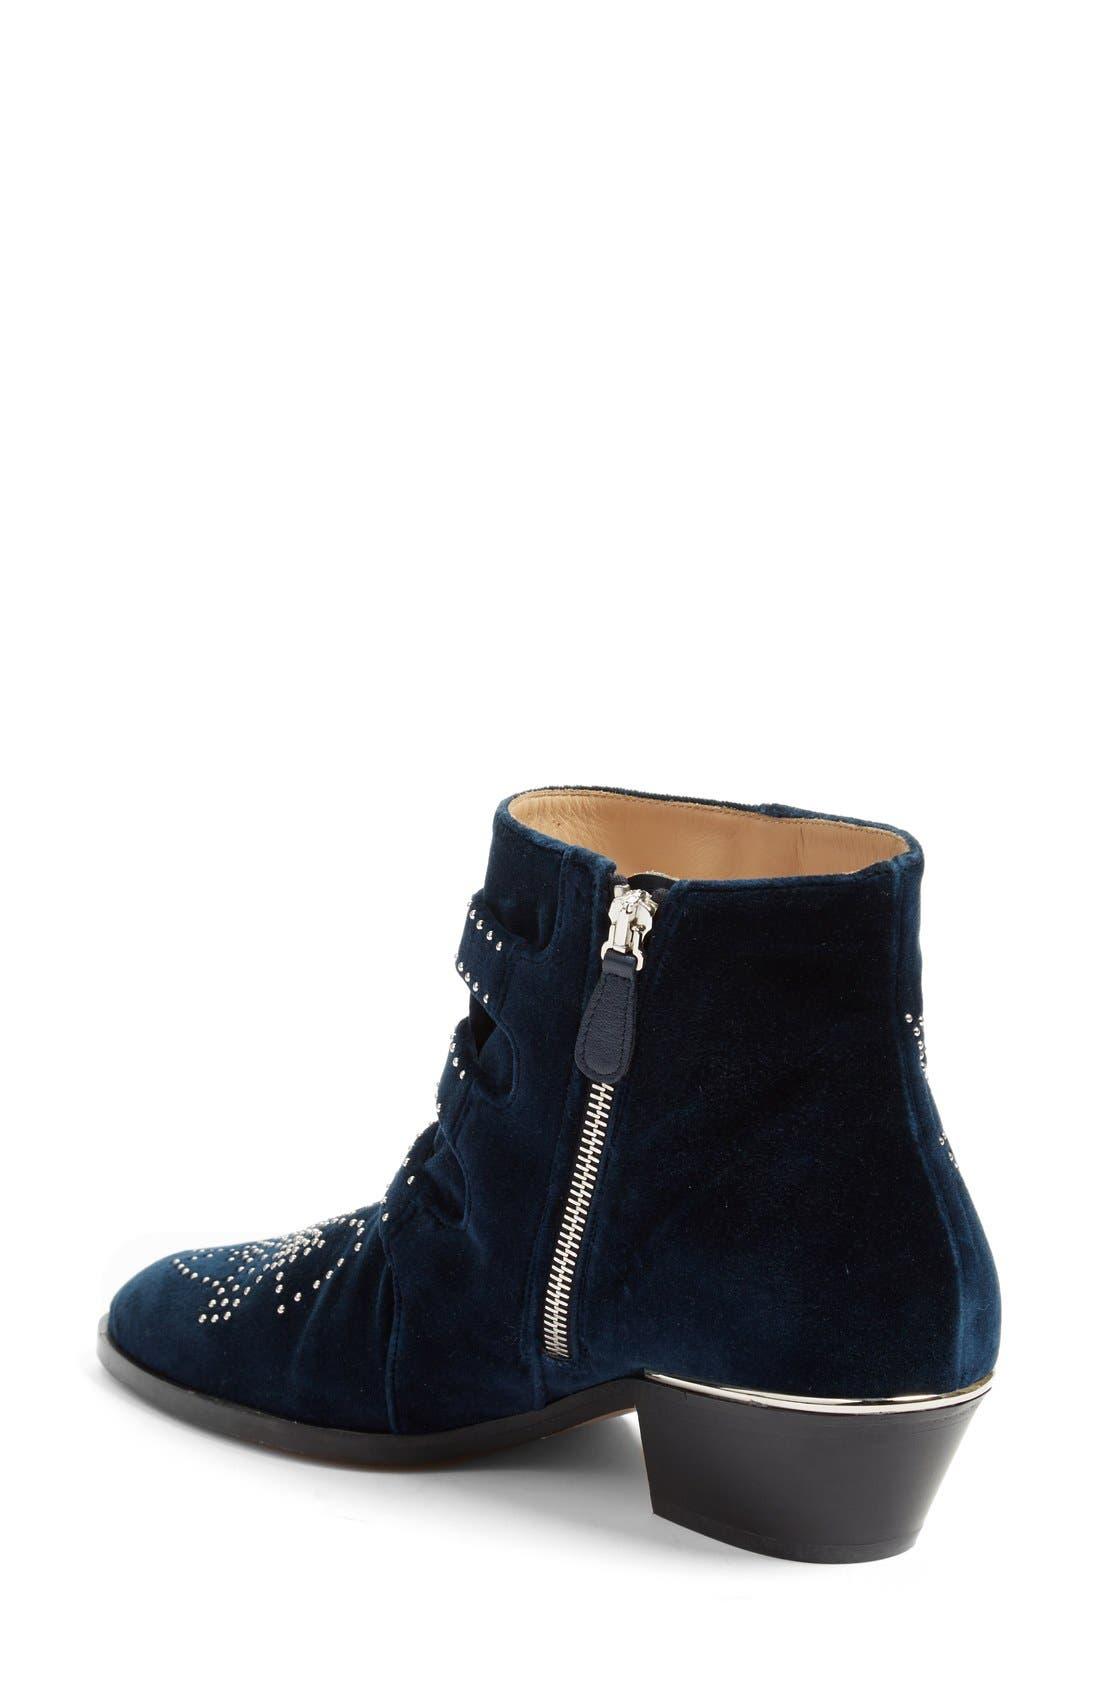 Alternate Image 2  - Chloé 'Susan' Studded Buckle Boot (Women)